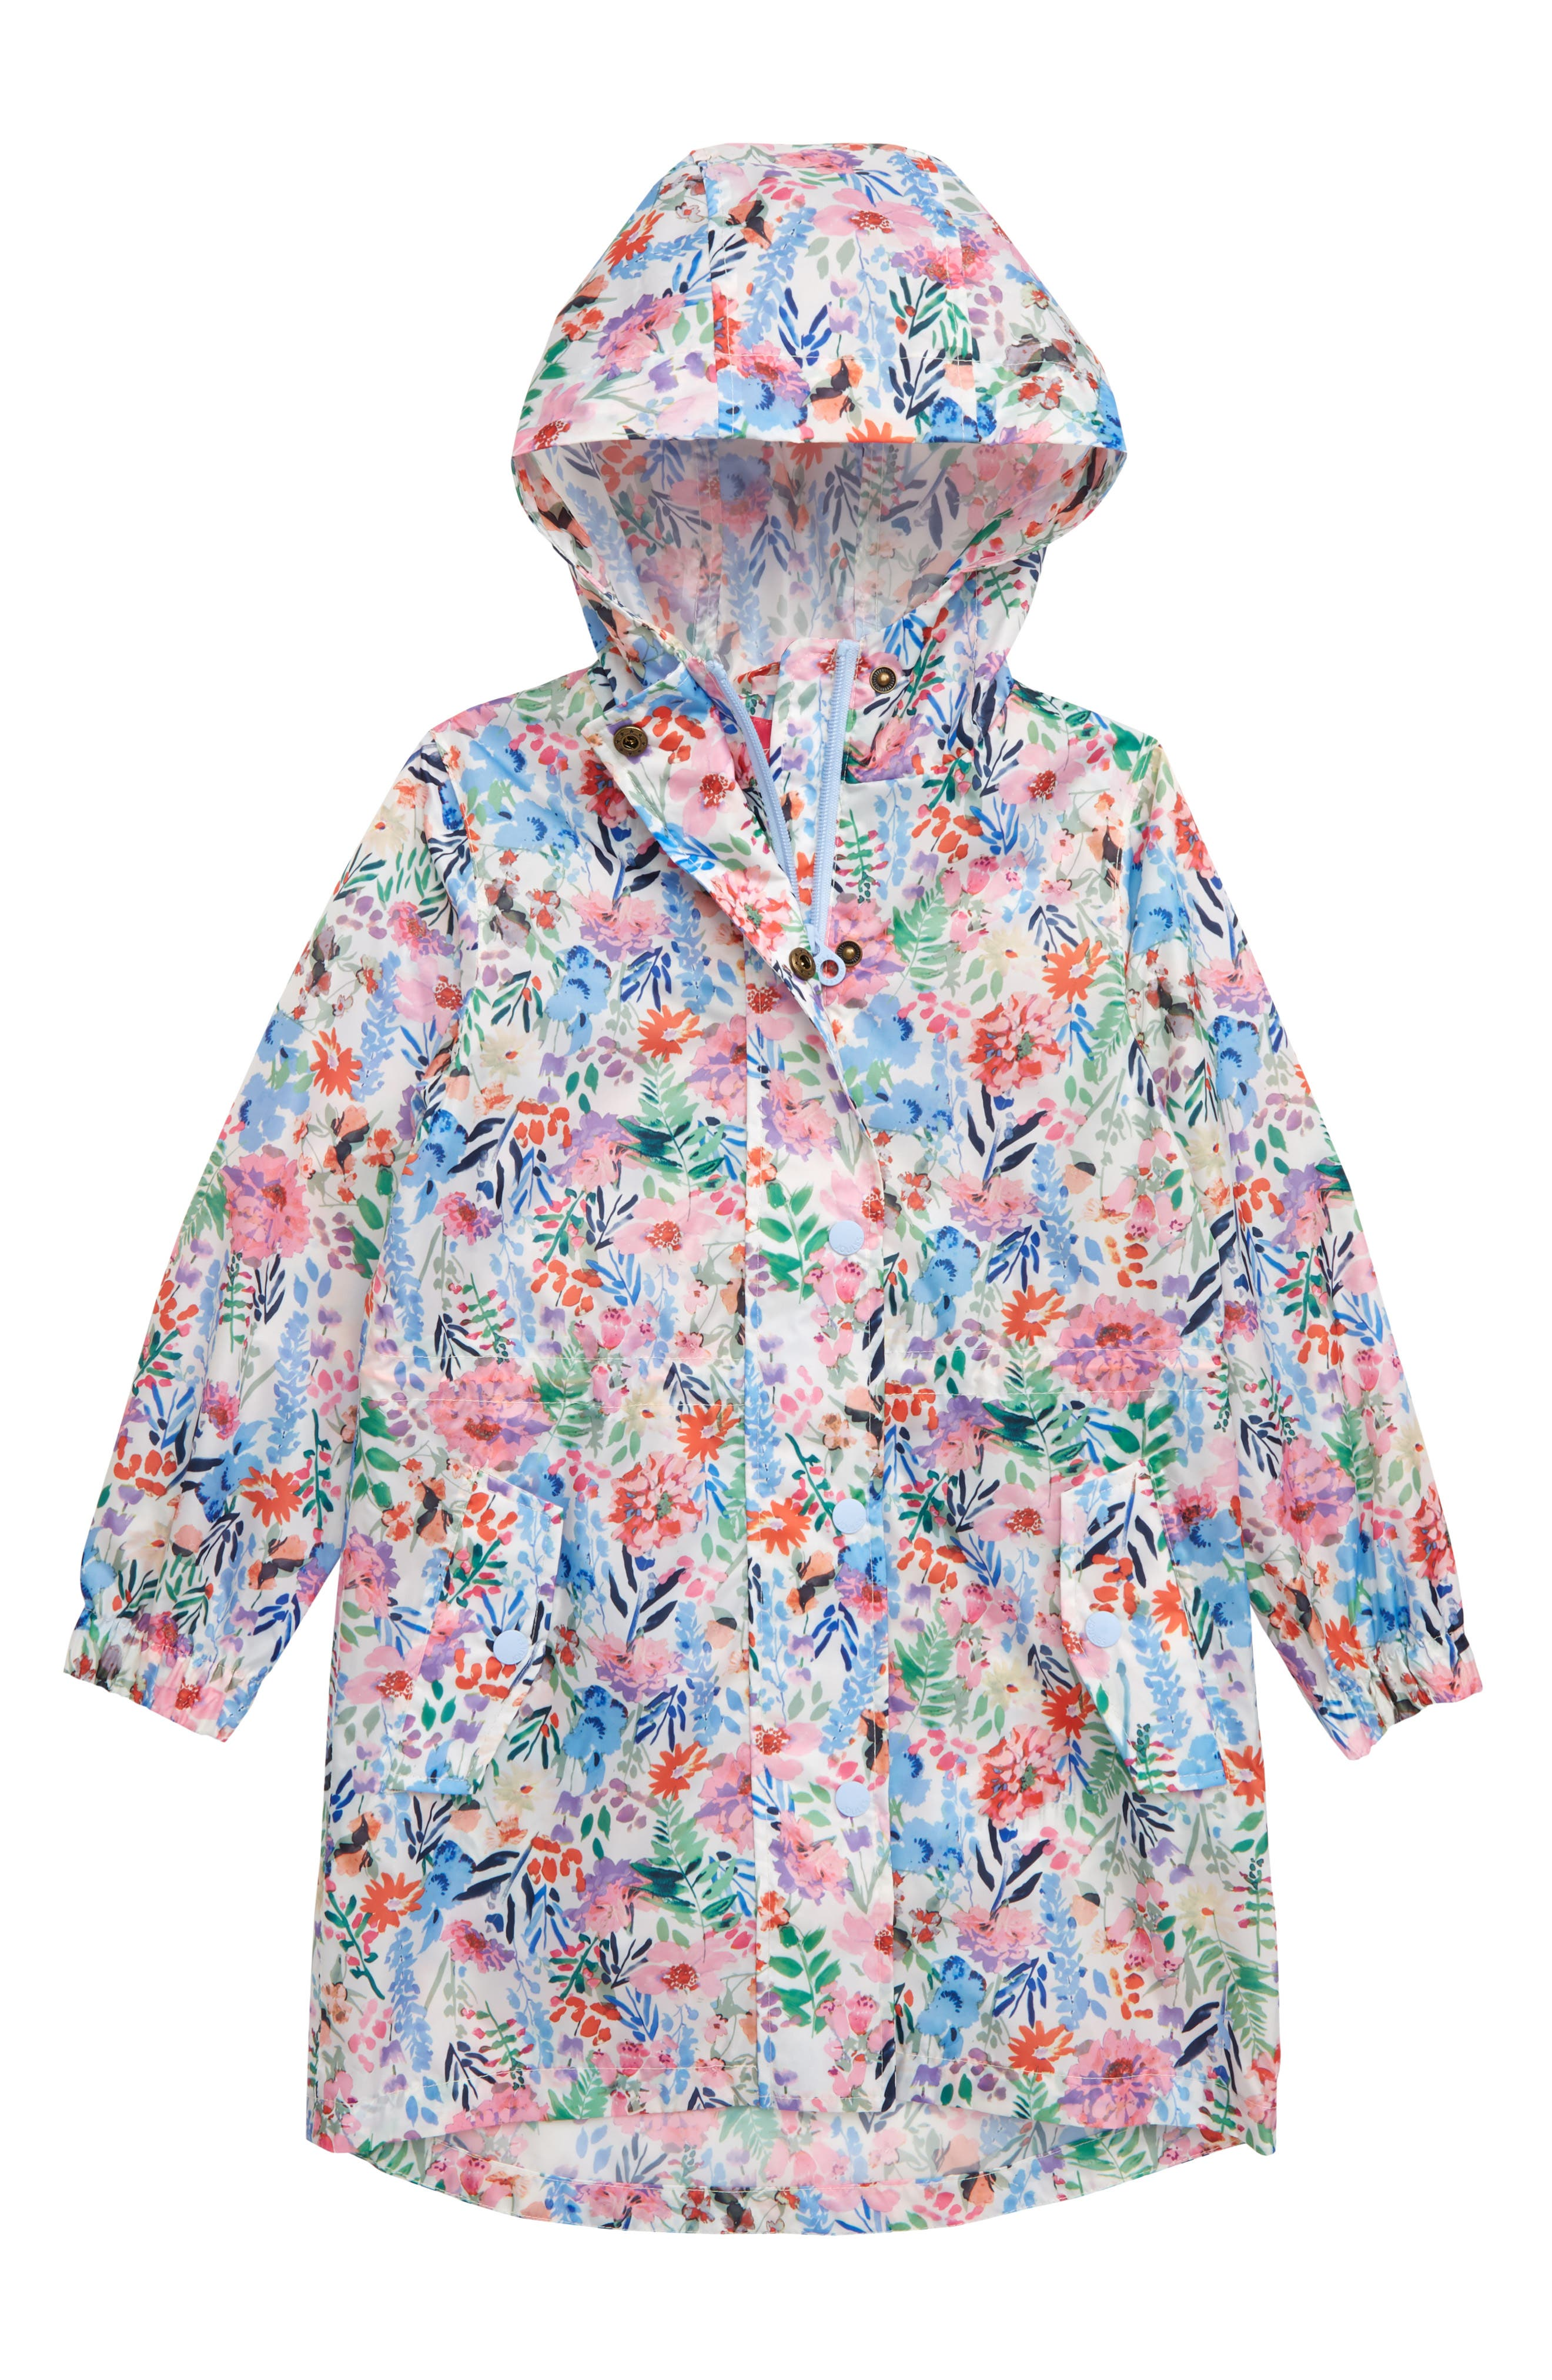 Toddler Girls Joules Golightly Packable Waterproof Rain Jacket Size 3Y  Ivory